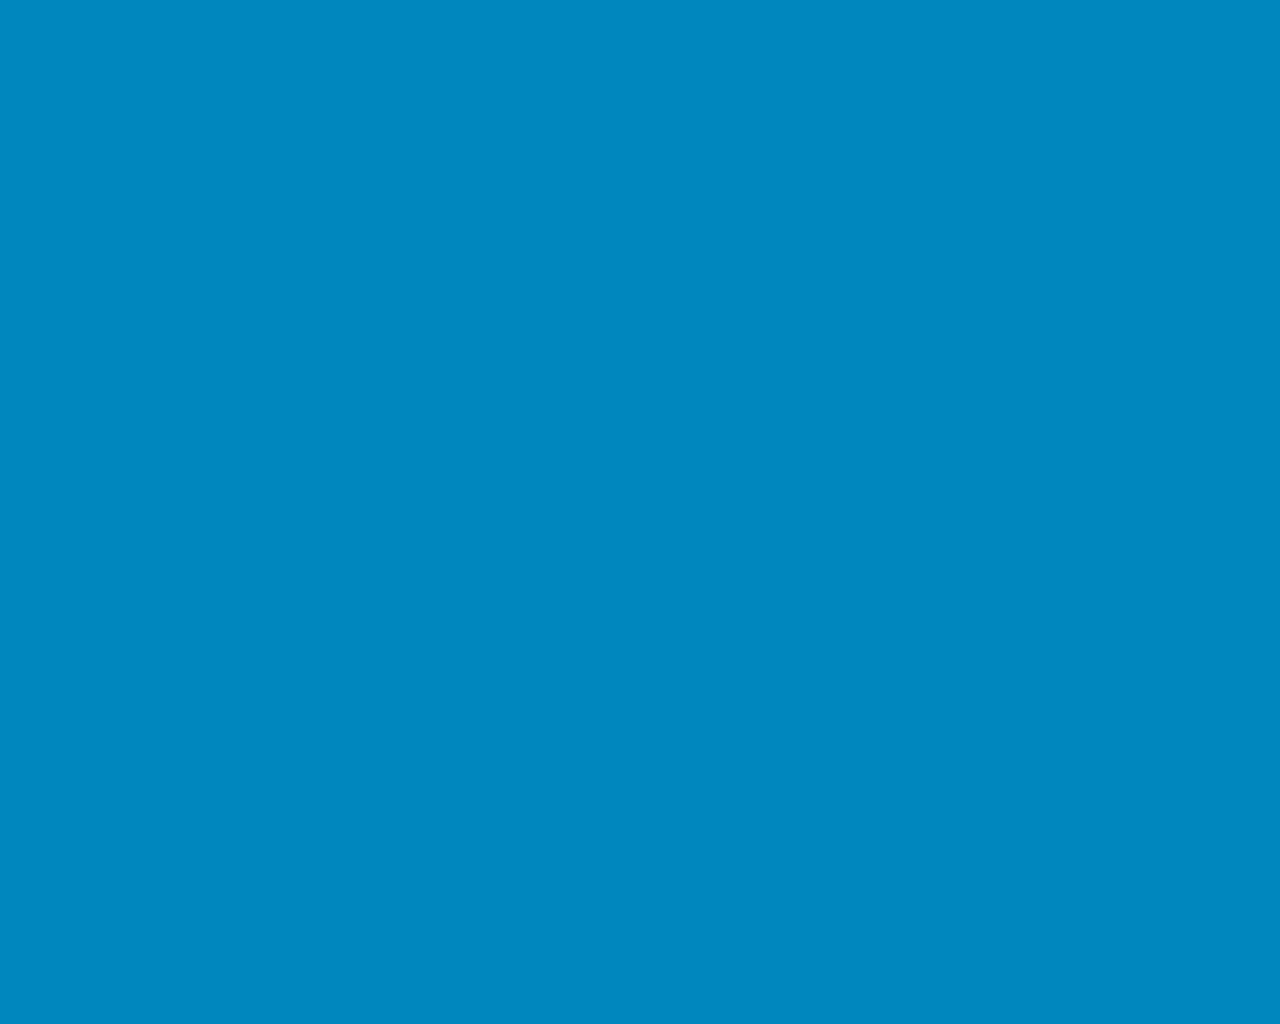 1280x1024 Blue NCS Solid Color Background